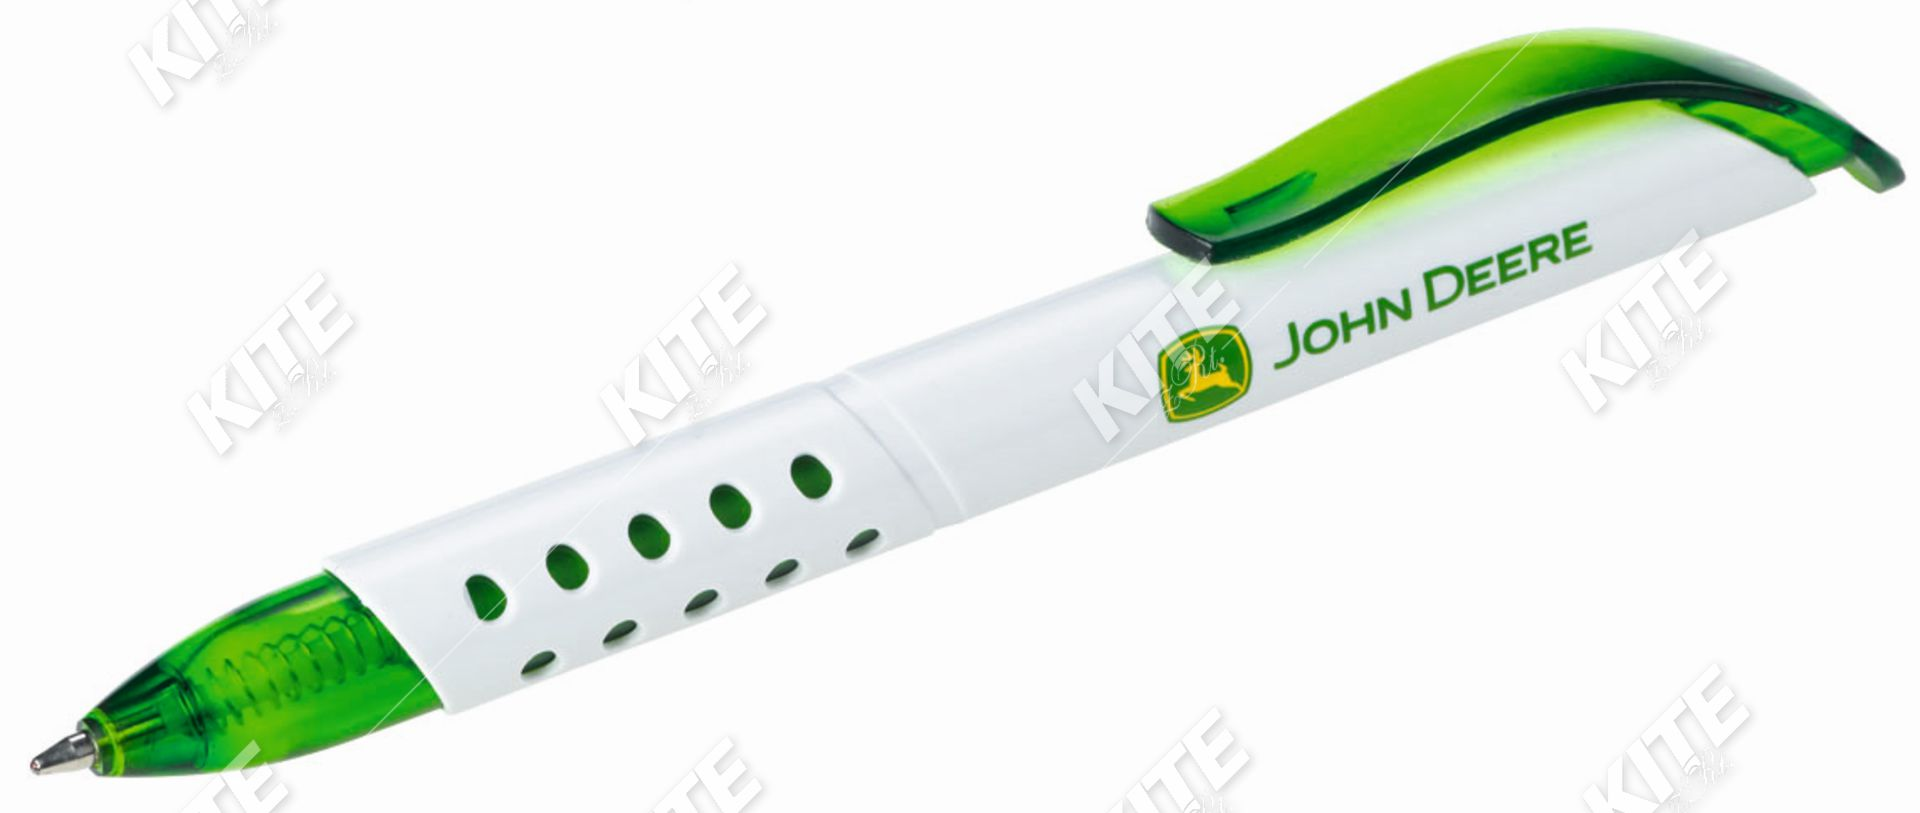 John Deere toll